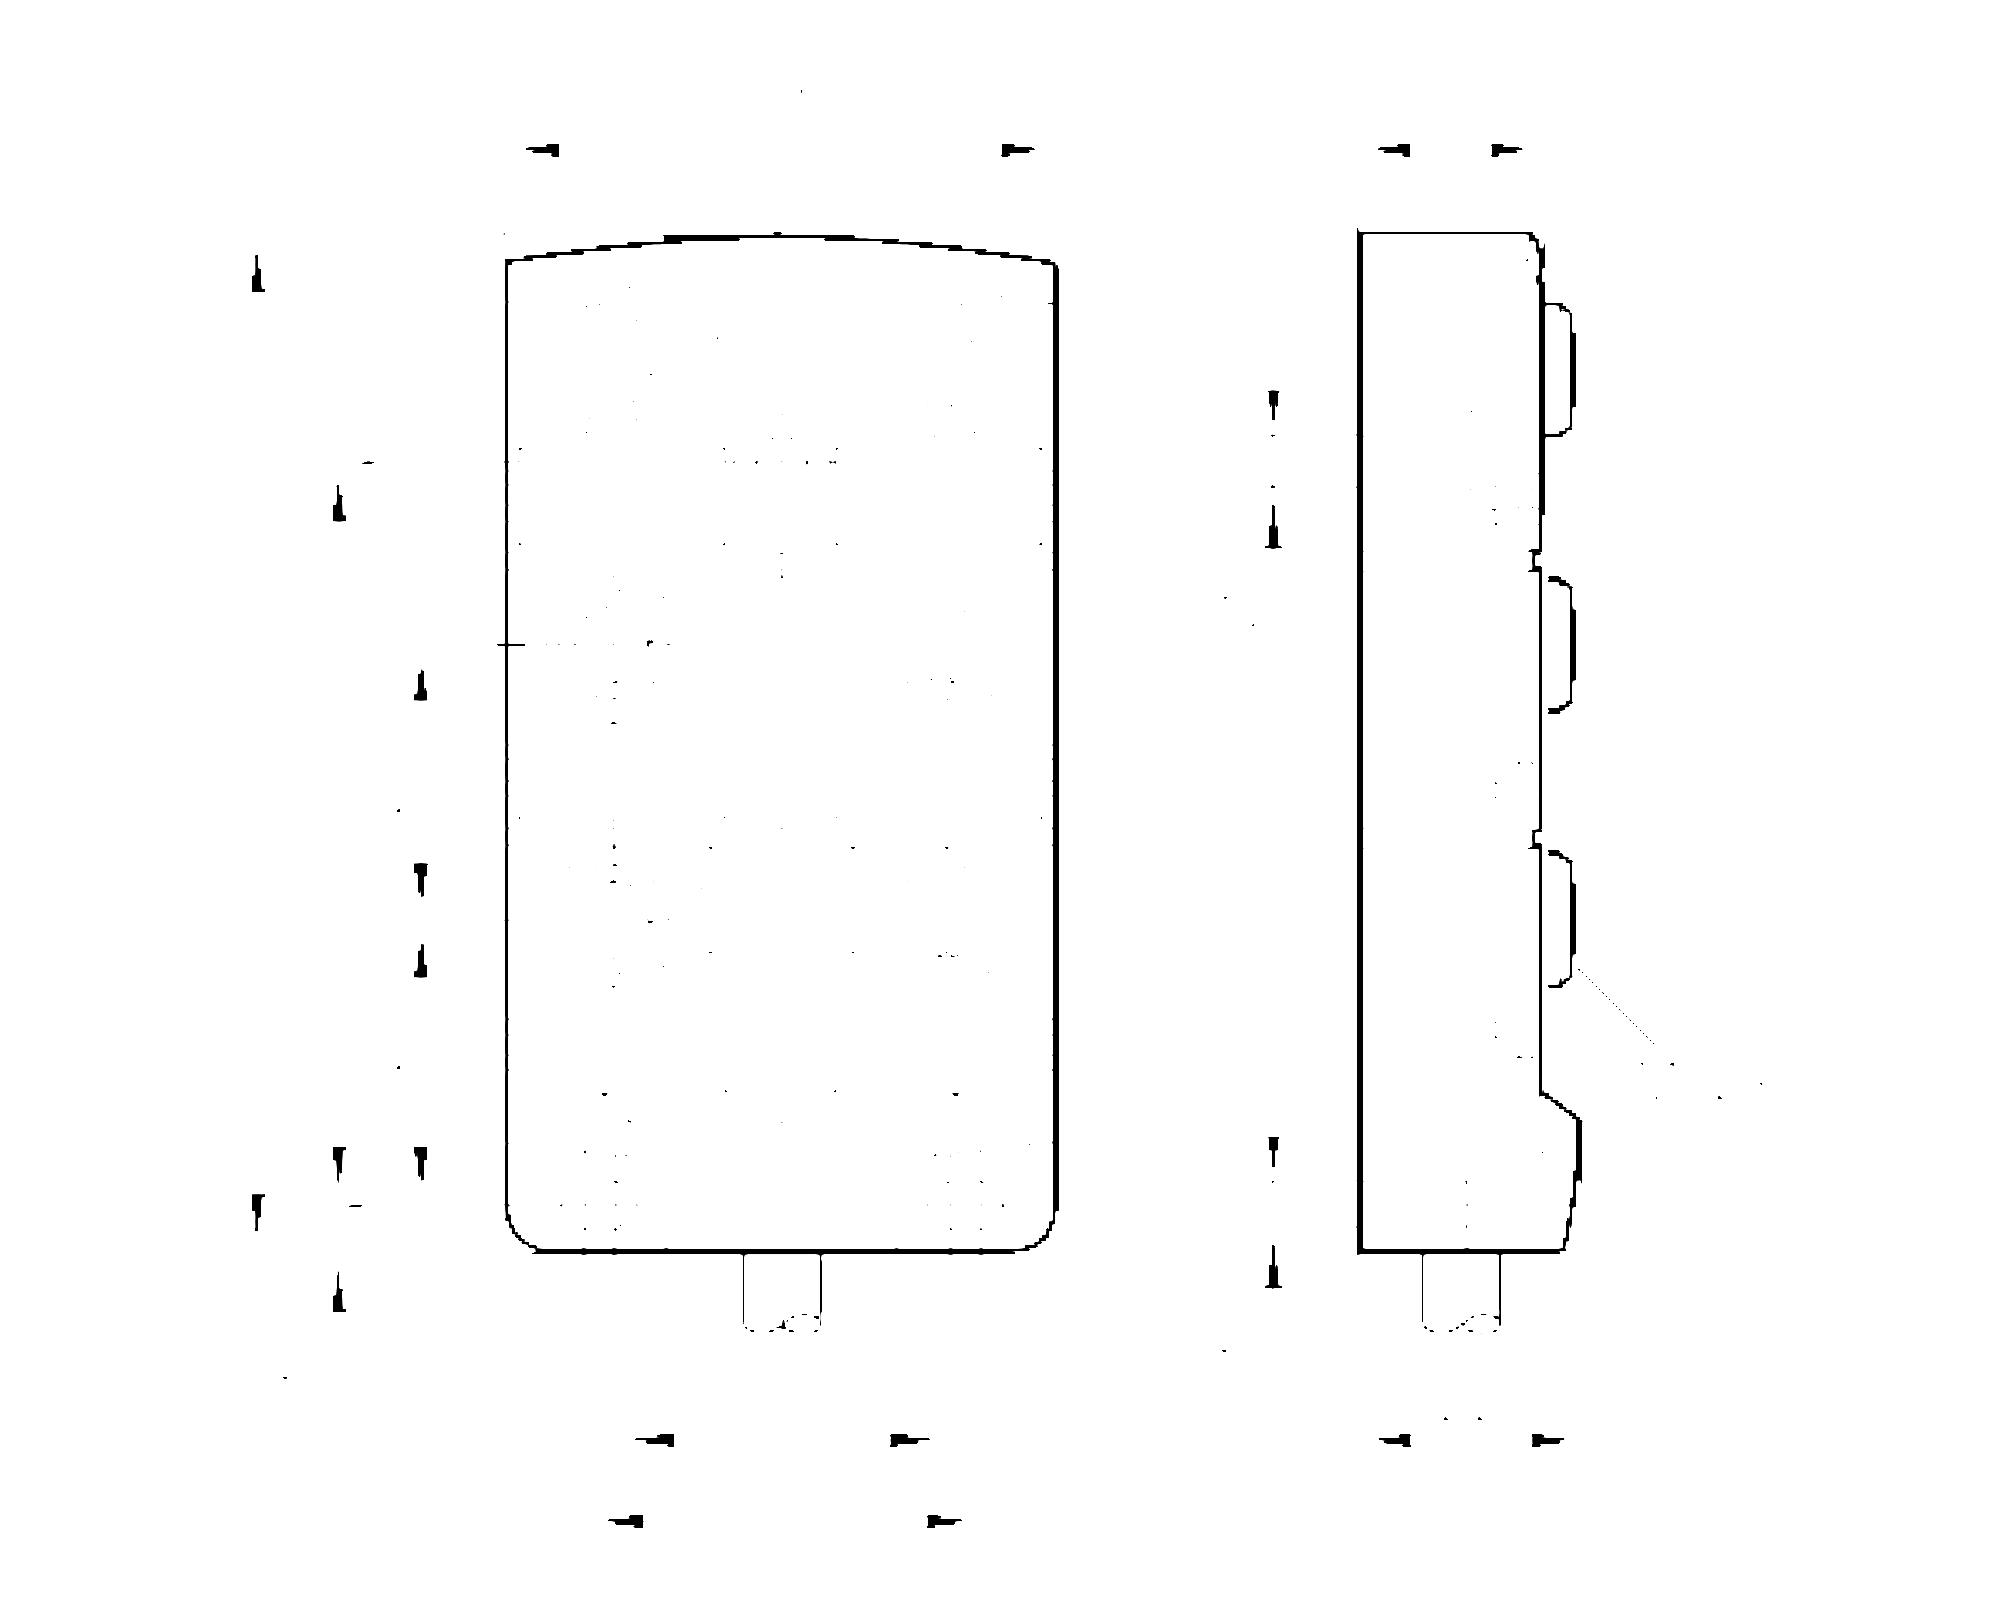 ebc020 wiring block ifm electronic IFM Level Sensor scale drawing